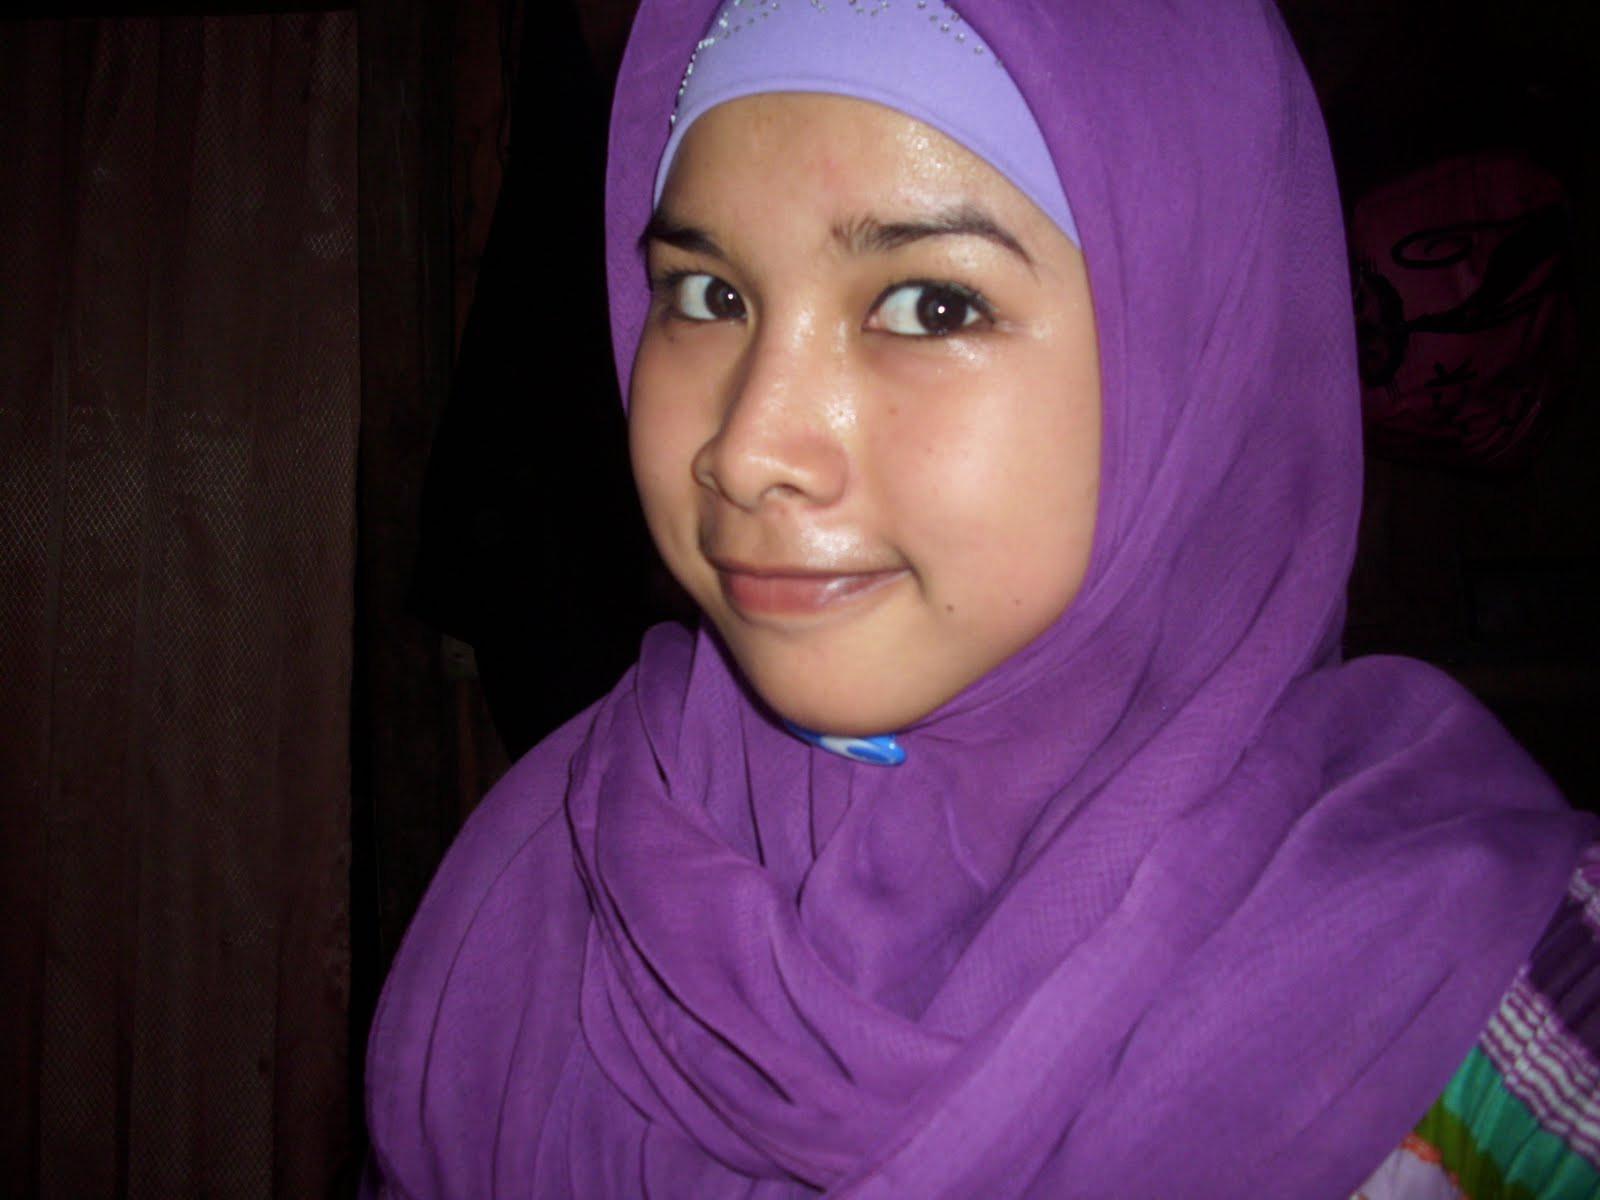 Rawan_3